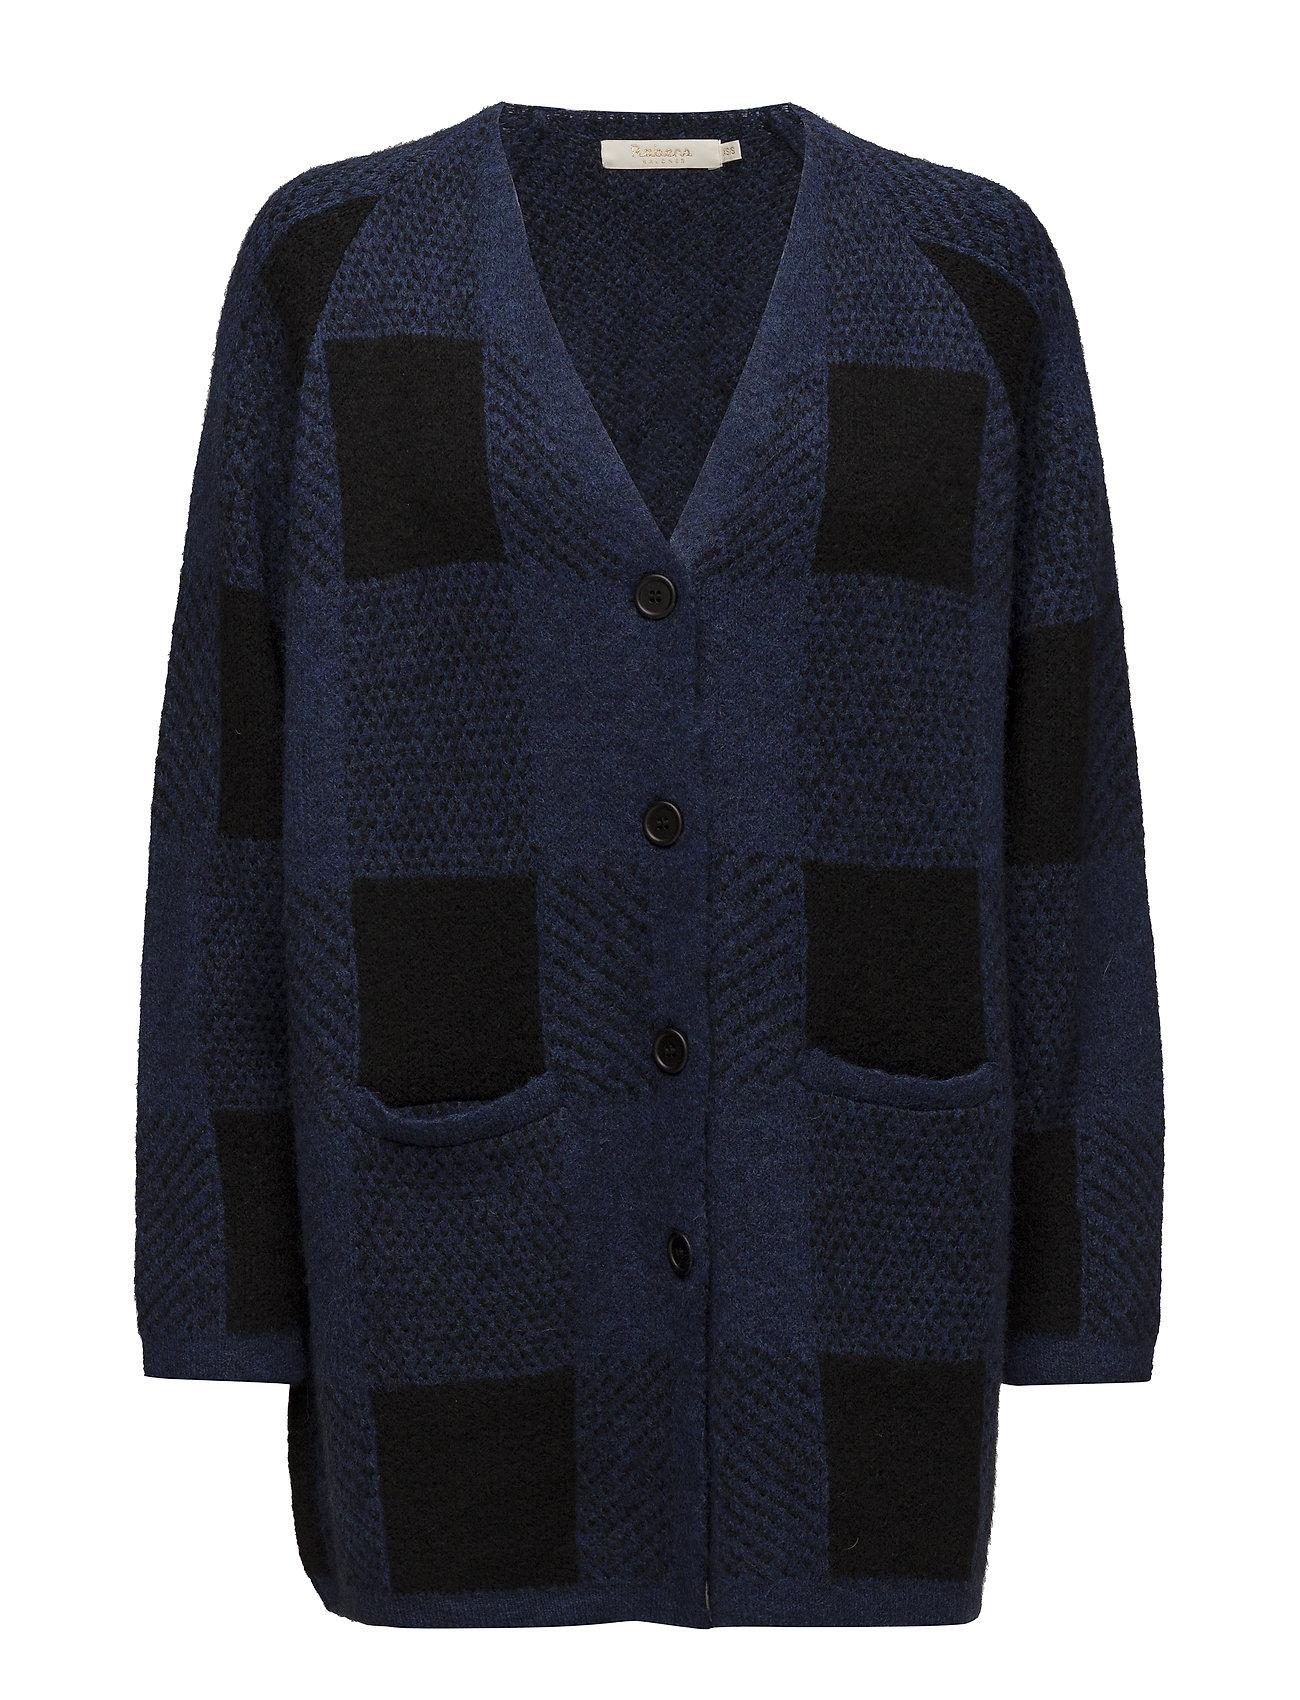 Rabens Saloner Blurred check cardigan - BLUE